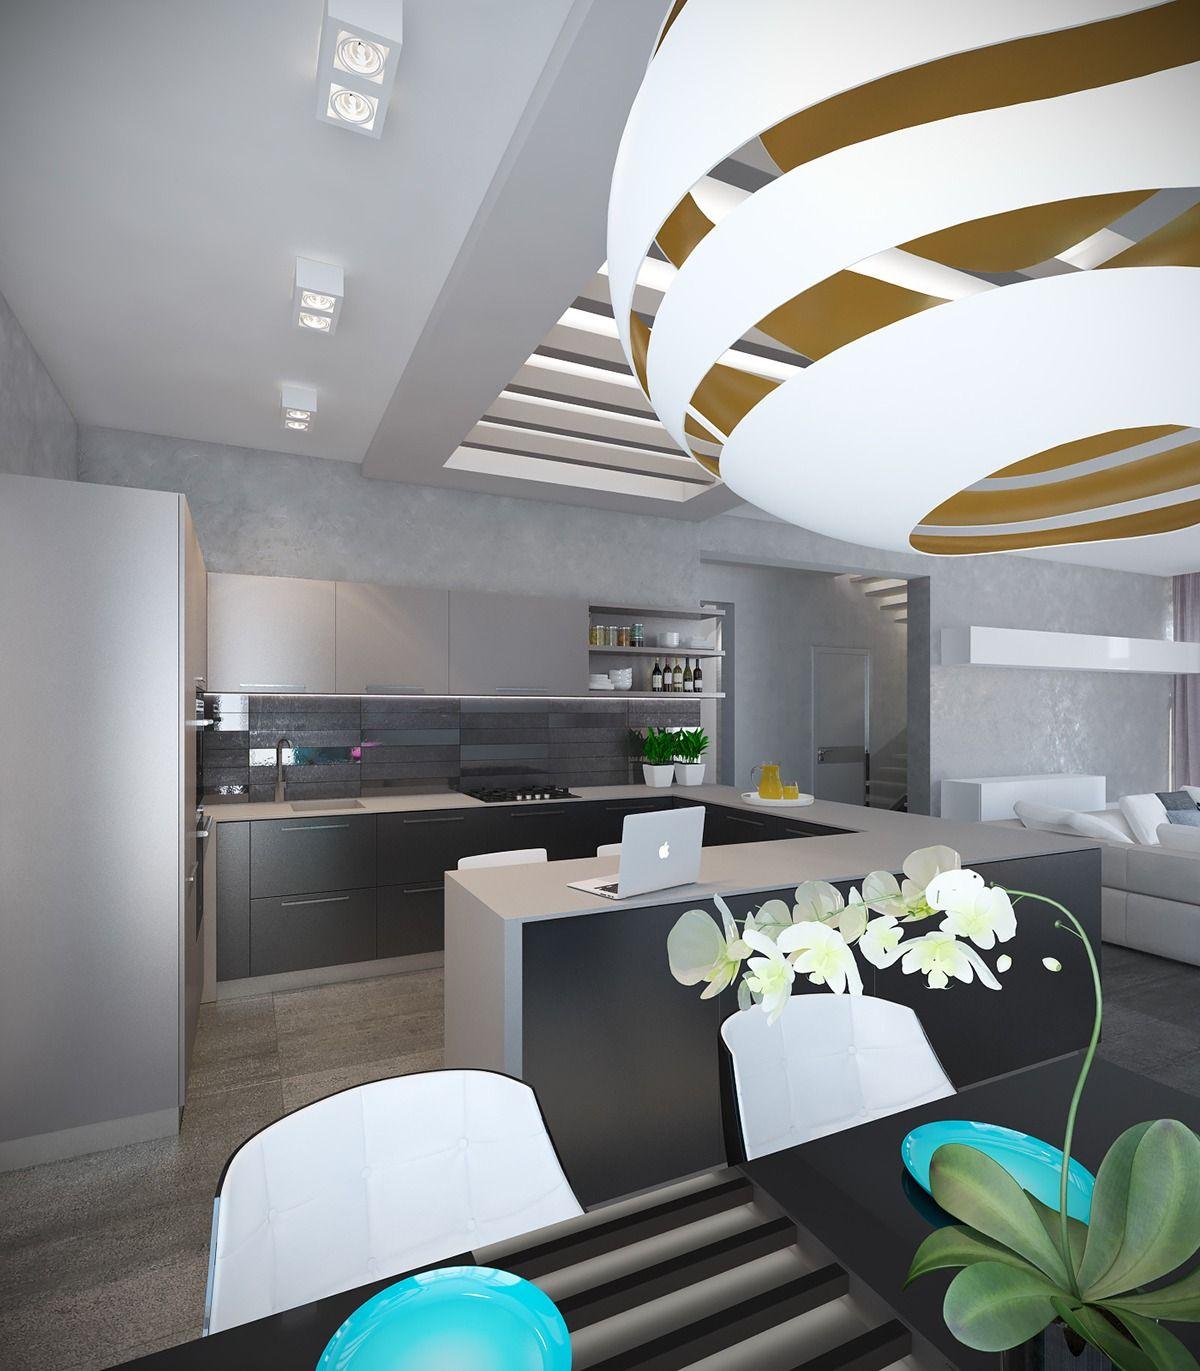 Home designing photo also interior design pinterest color themes rh